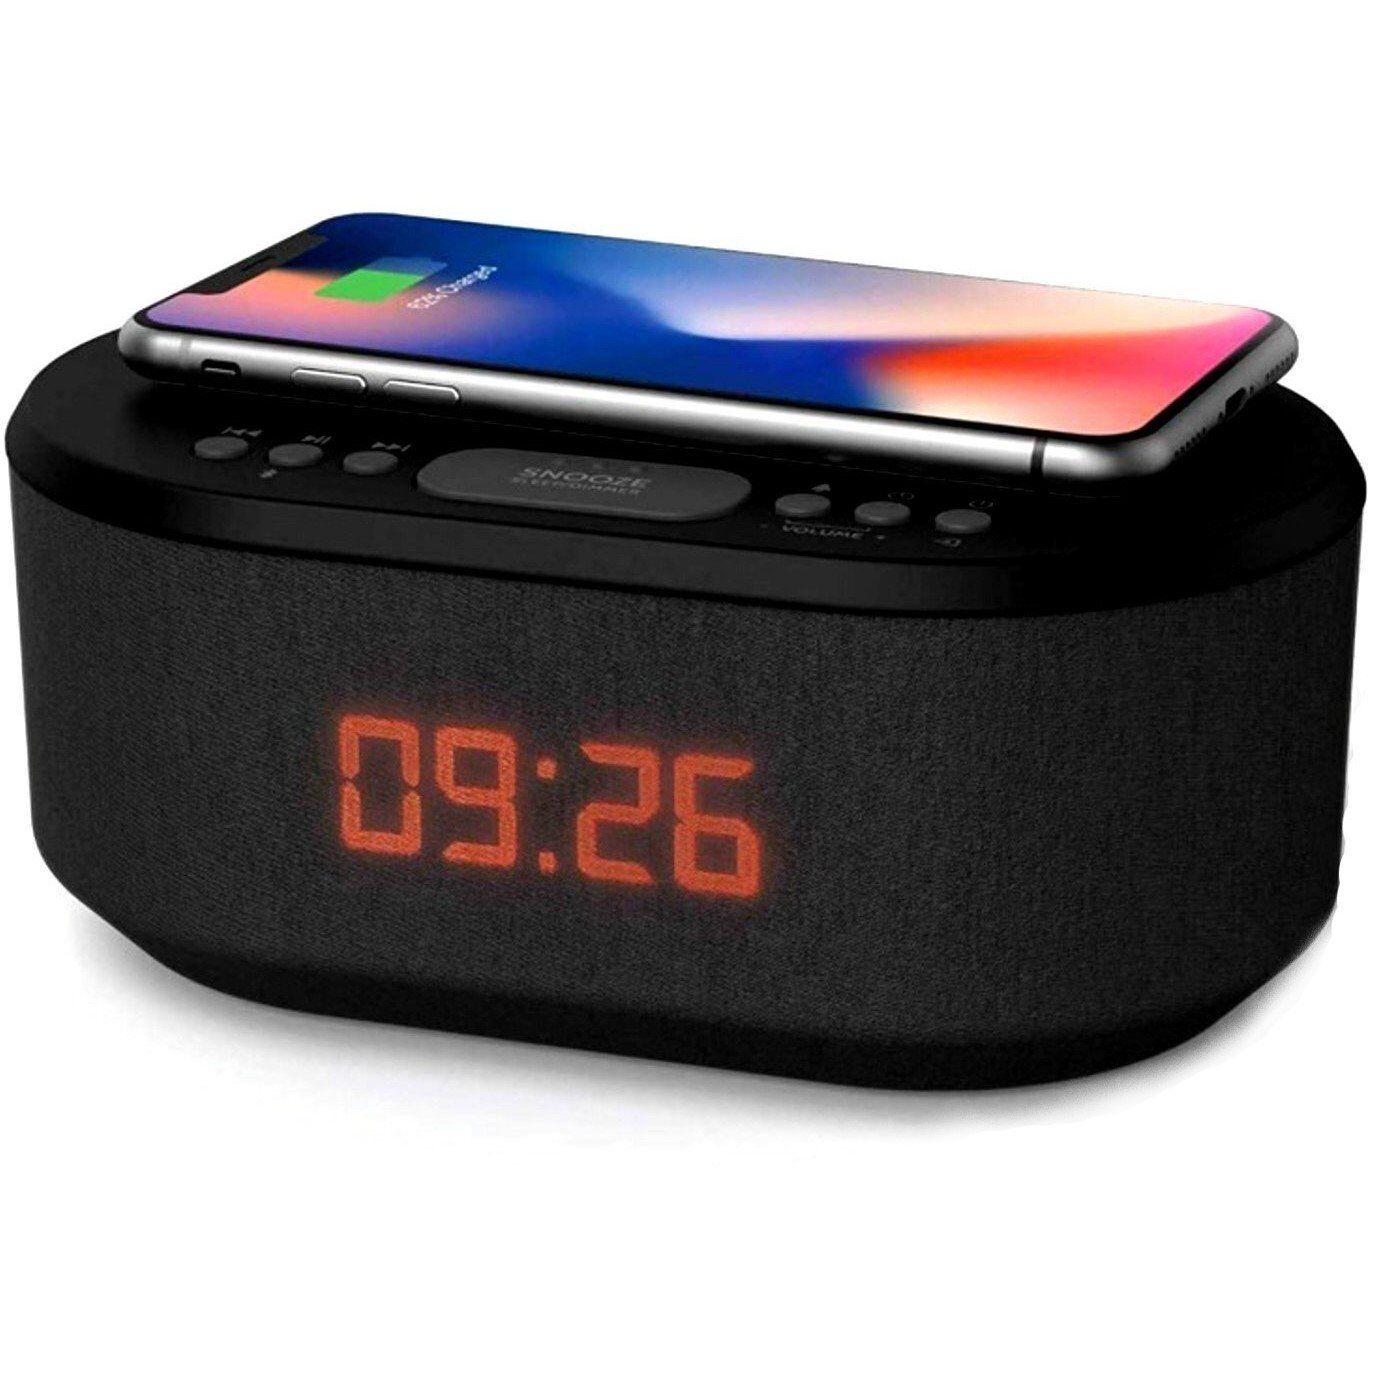 HomeSecuritySuperstore QI Smartphone Charger Clock Radio Hidden Spy Camera 4K UHD WiFi